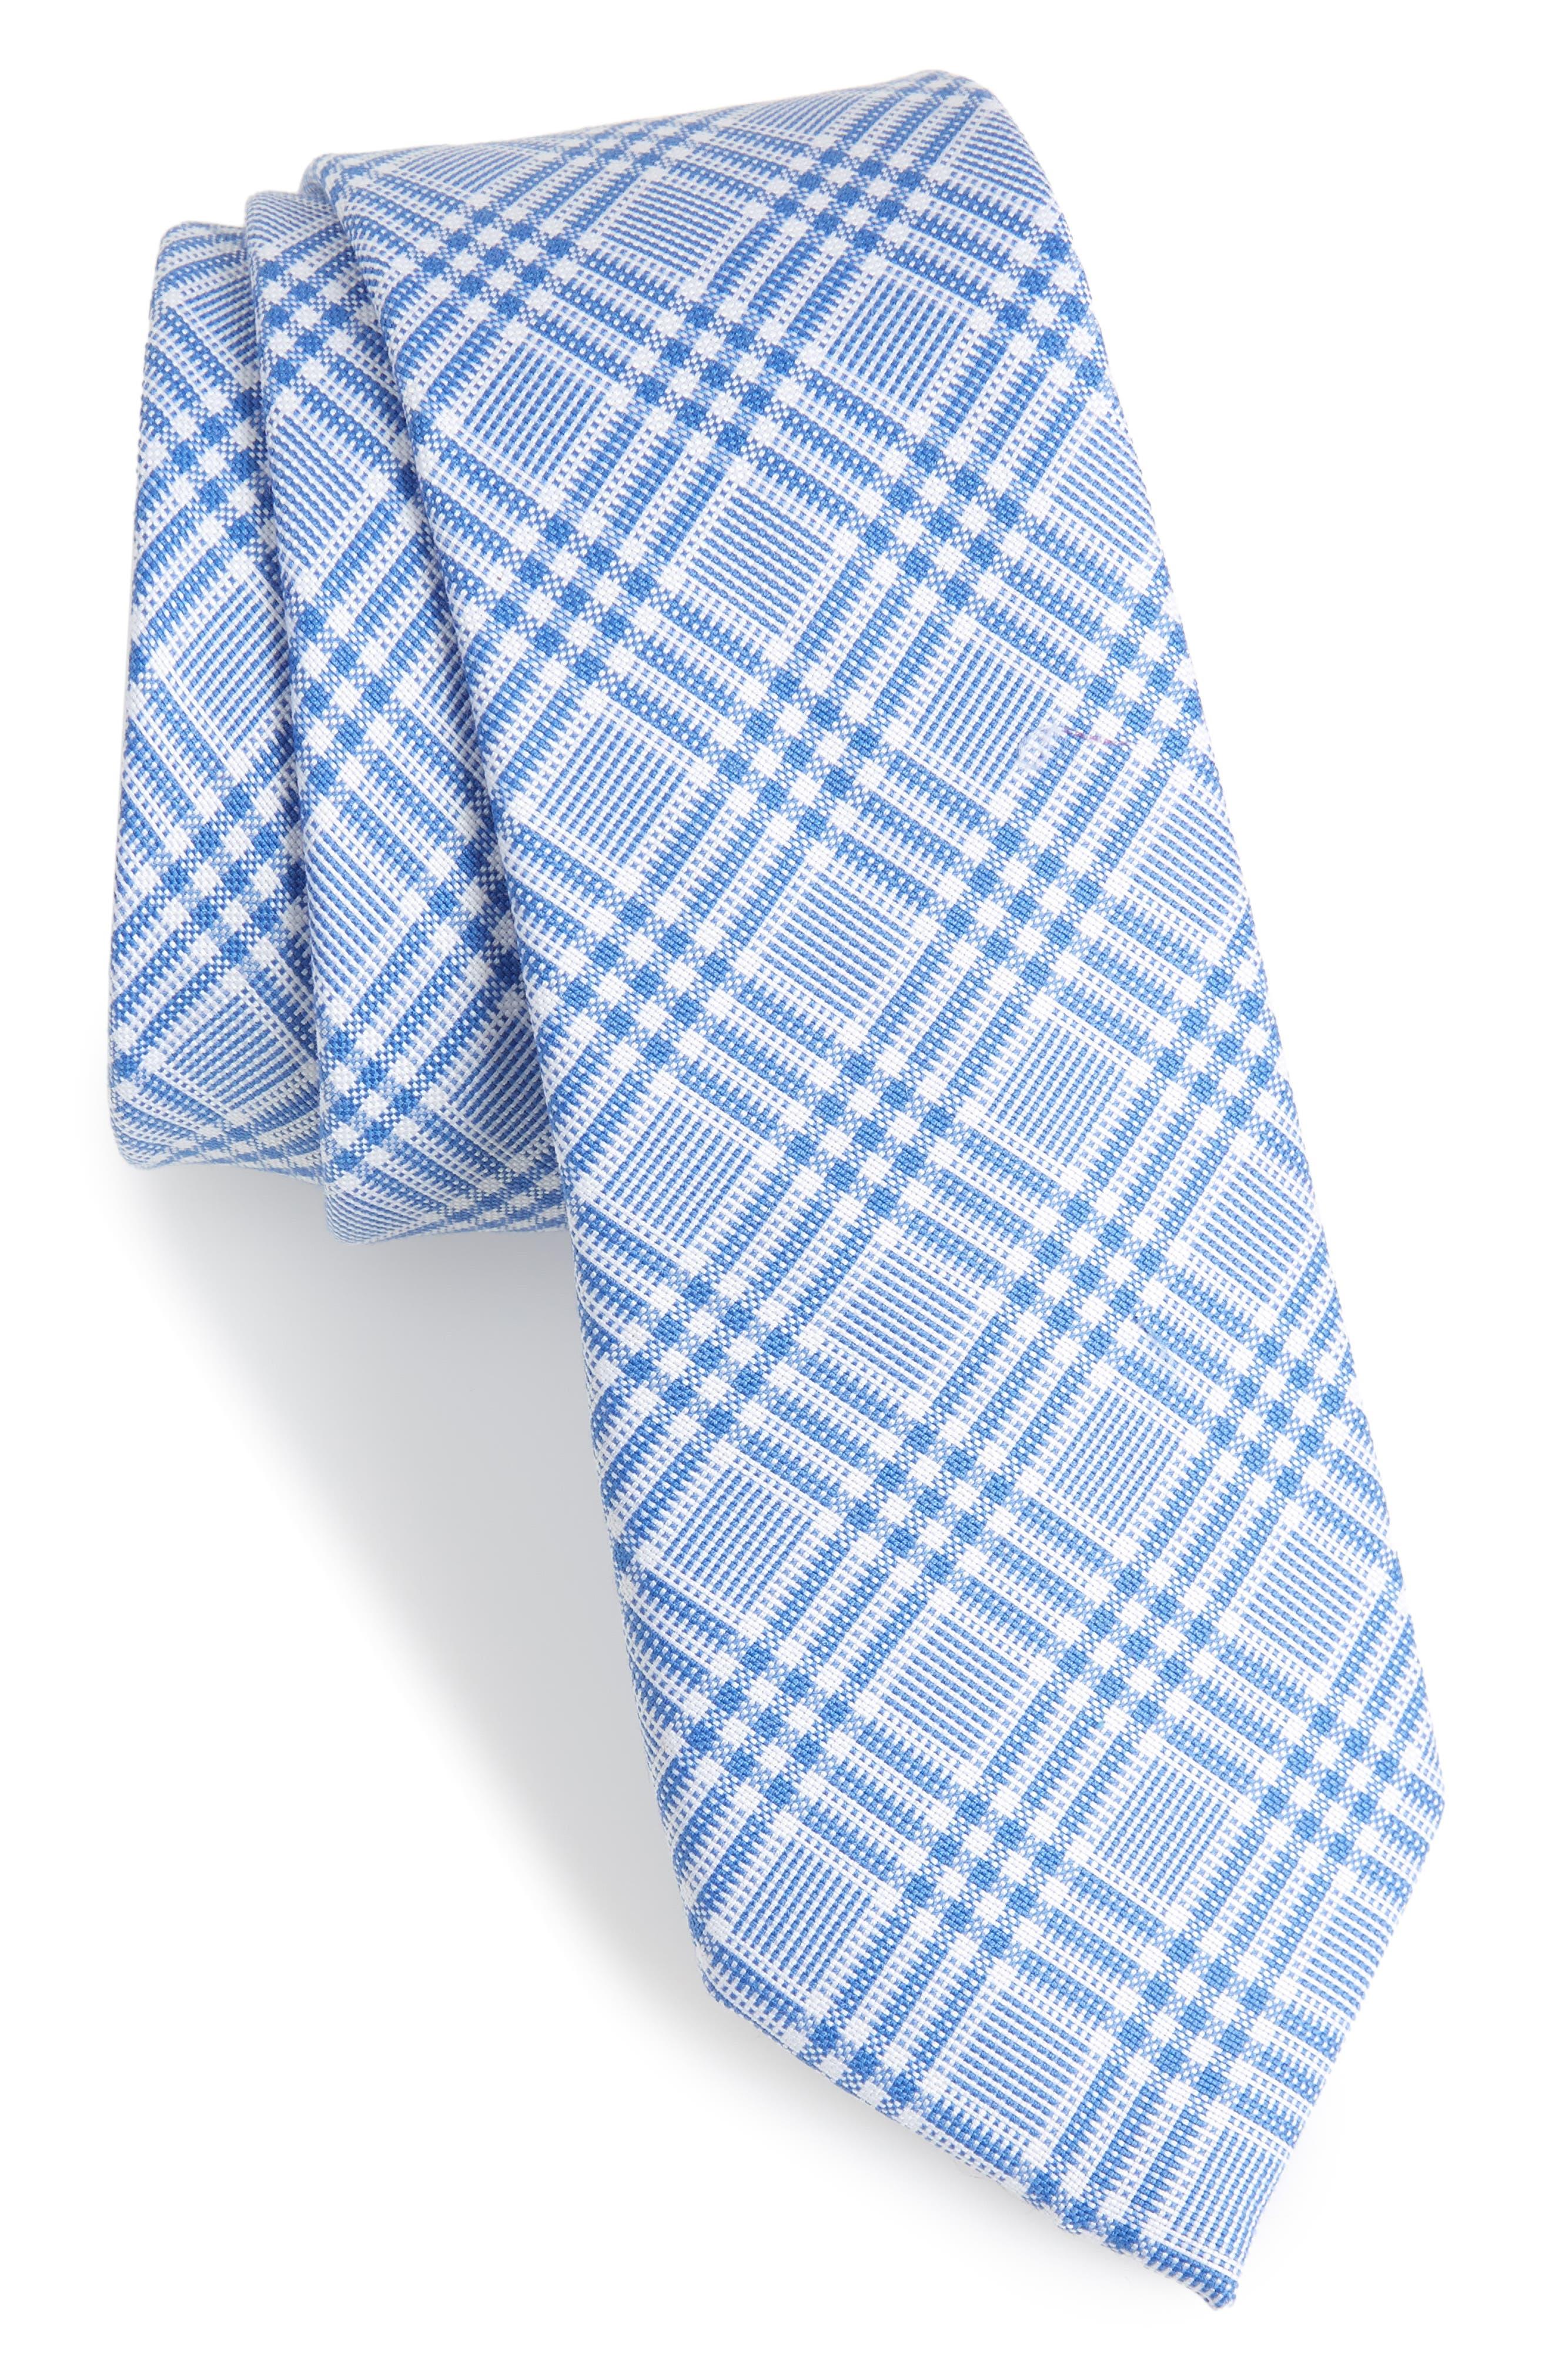 Brook Plaid Cotton Skinny Tie,                             Main thumbnail 1, color,